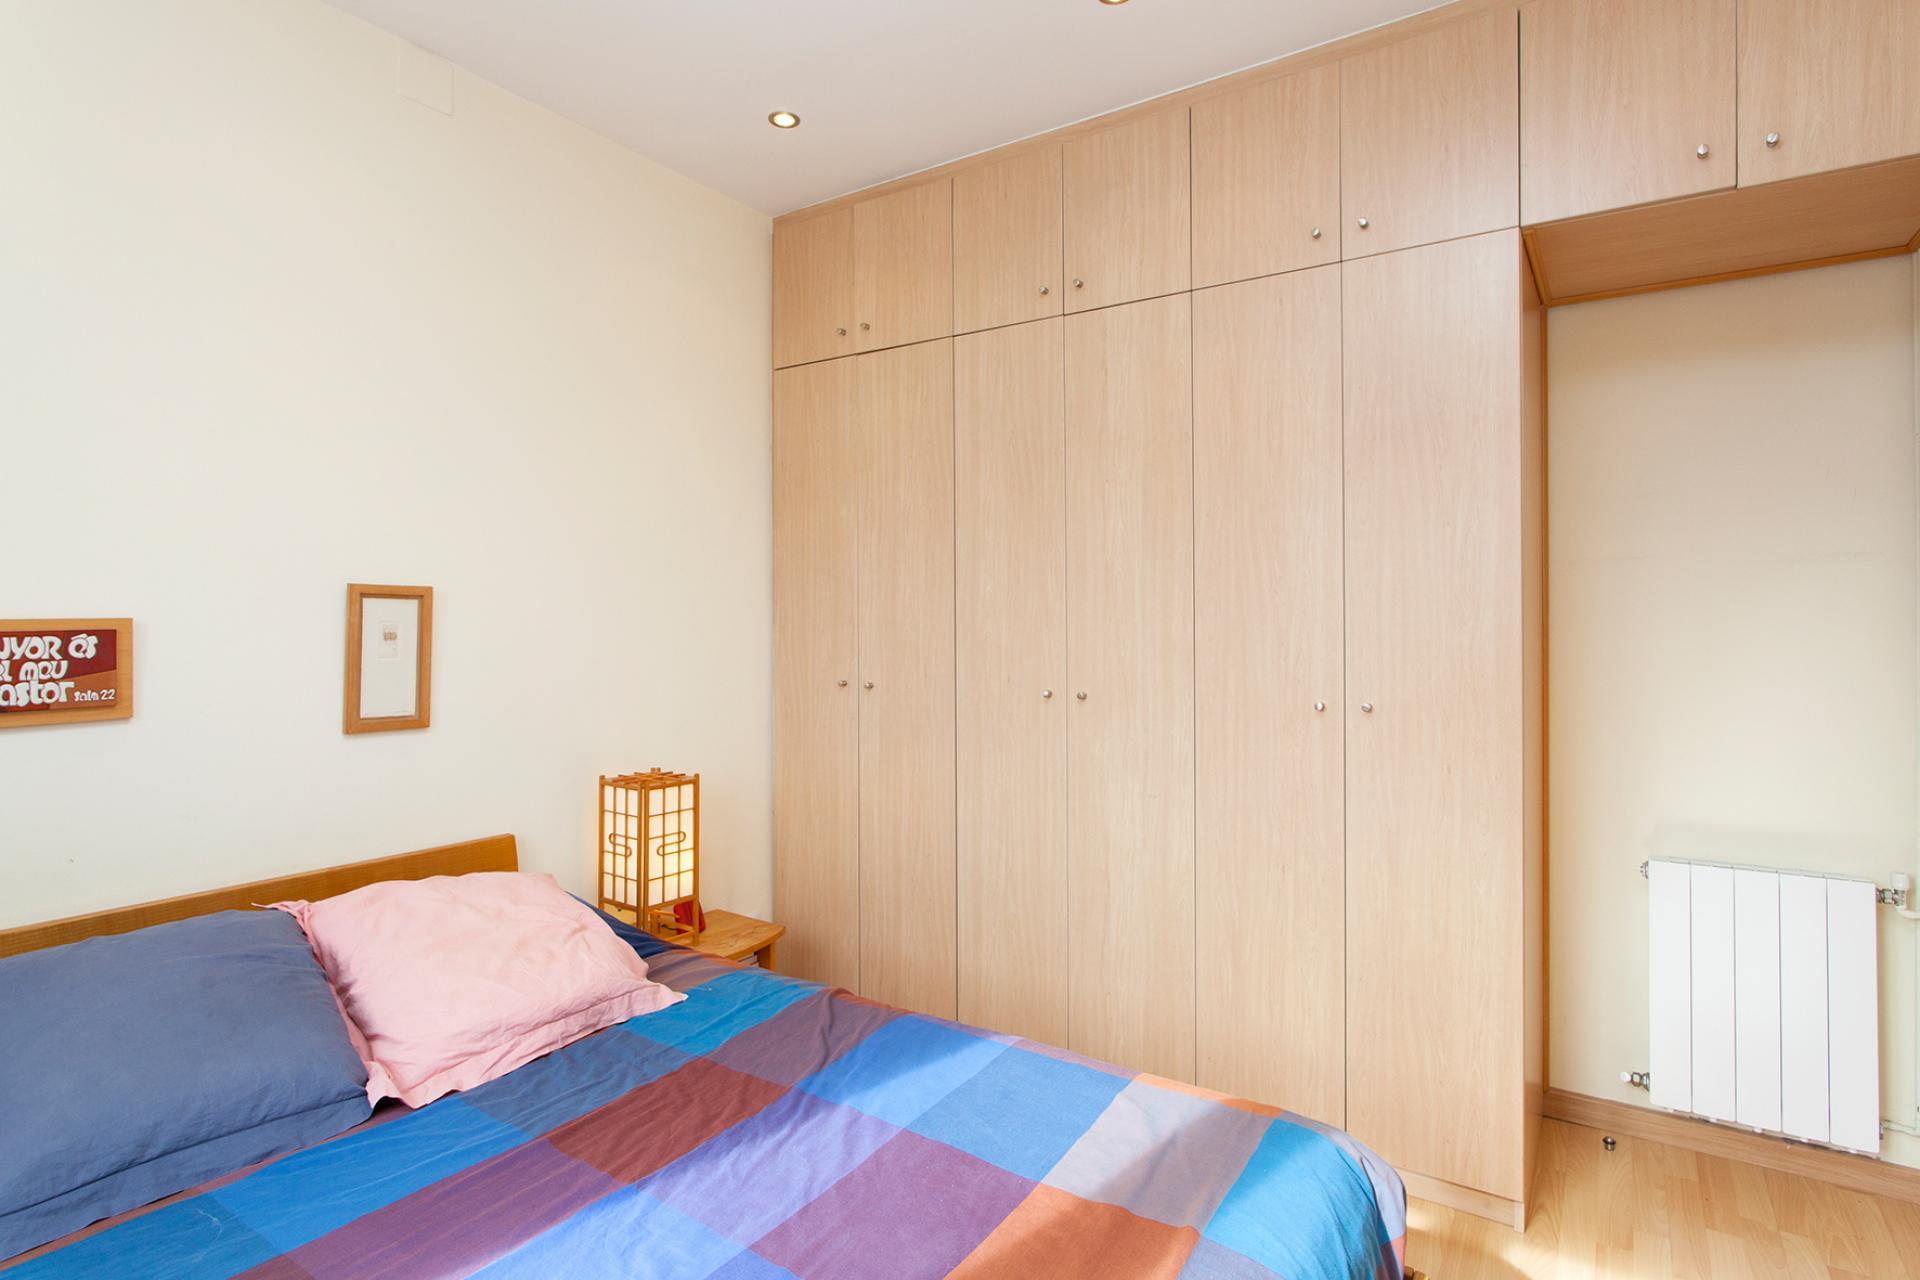 Apartment Sale Barcelona Sant Mart Josepa Massanes Besalu # Muebles Google Translate